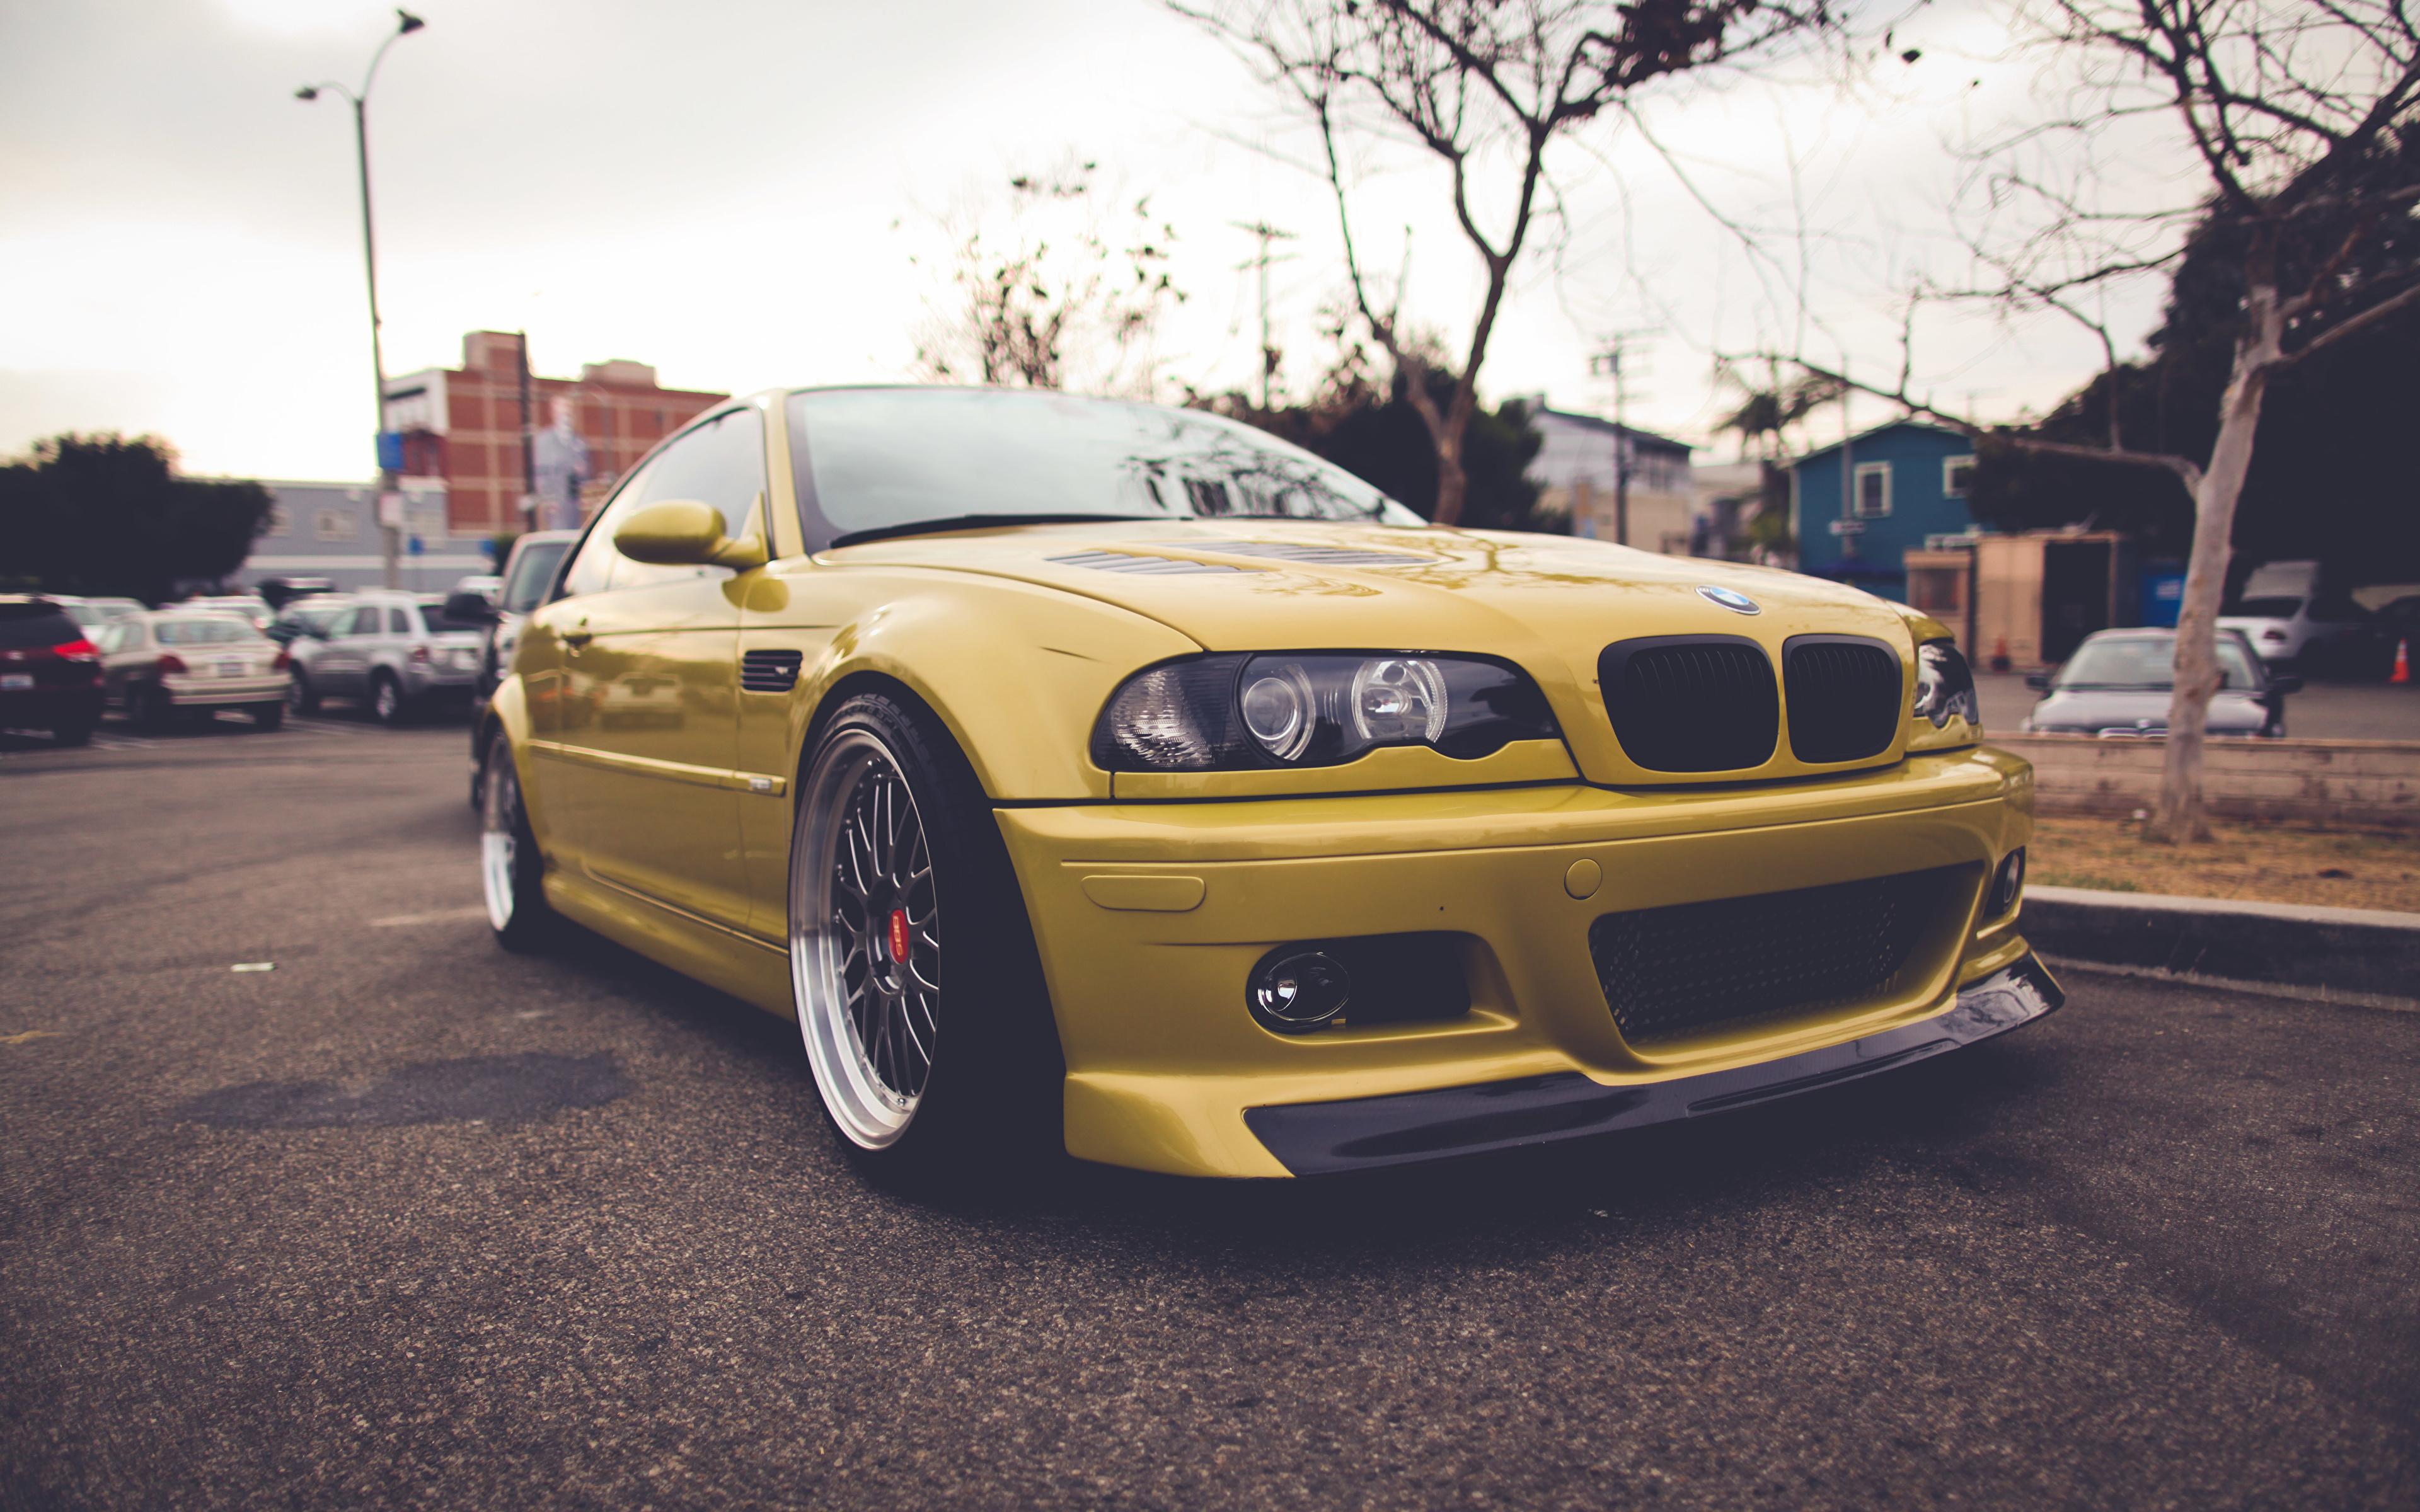 Images Bmw E46 Yellow Auto 3840x2400